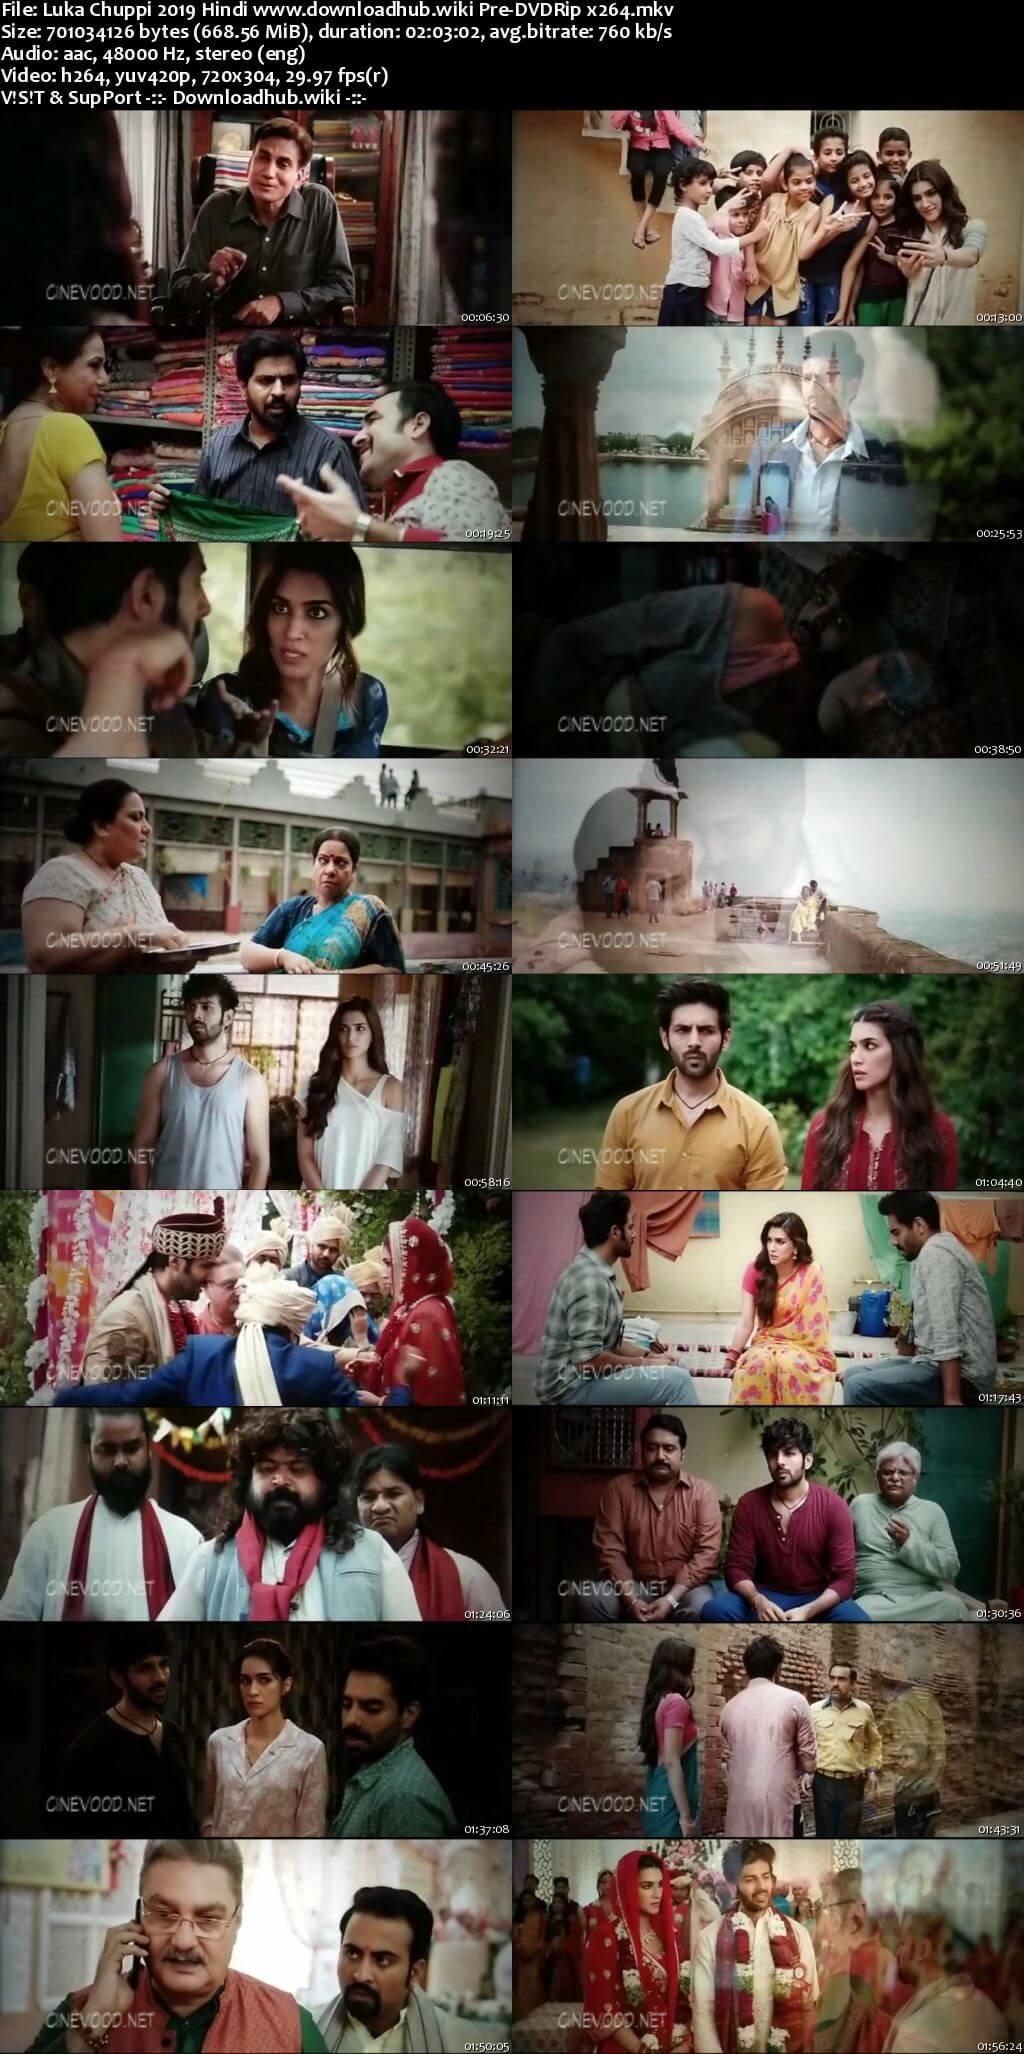 Luka Chuppi 2019 Hindi 700MB Pre-DVDRip x264